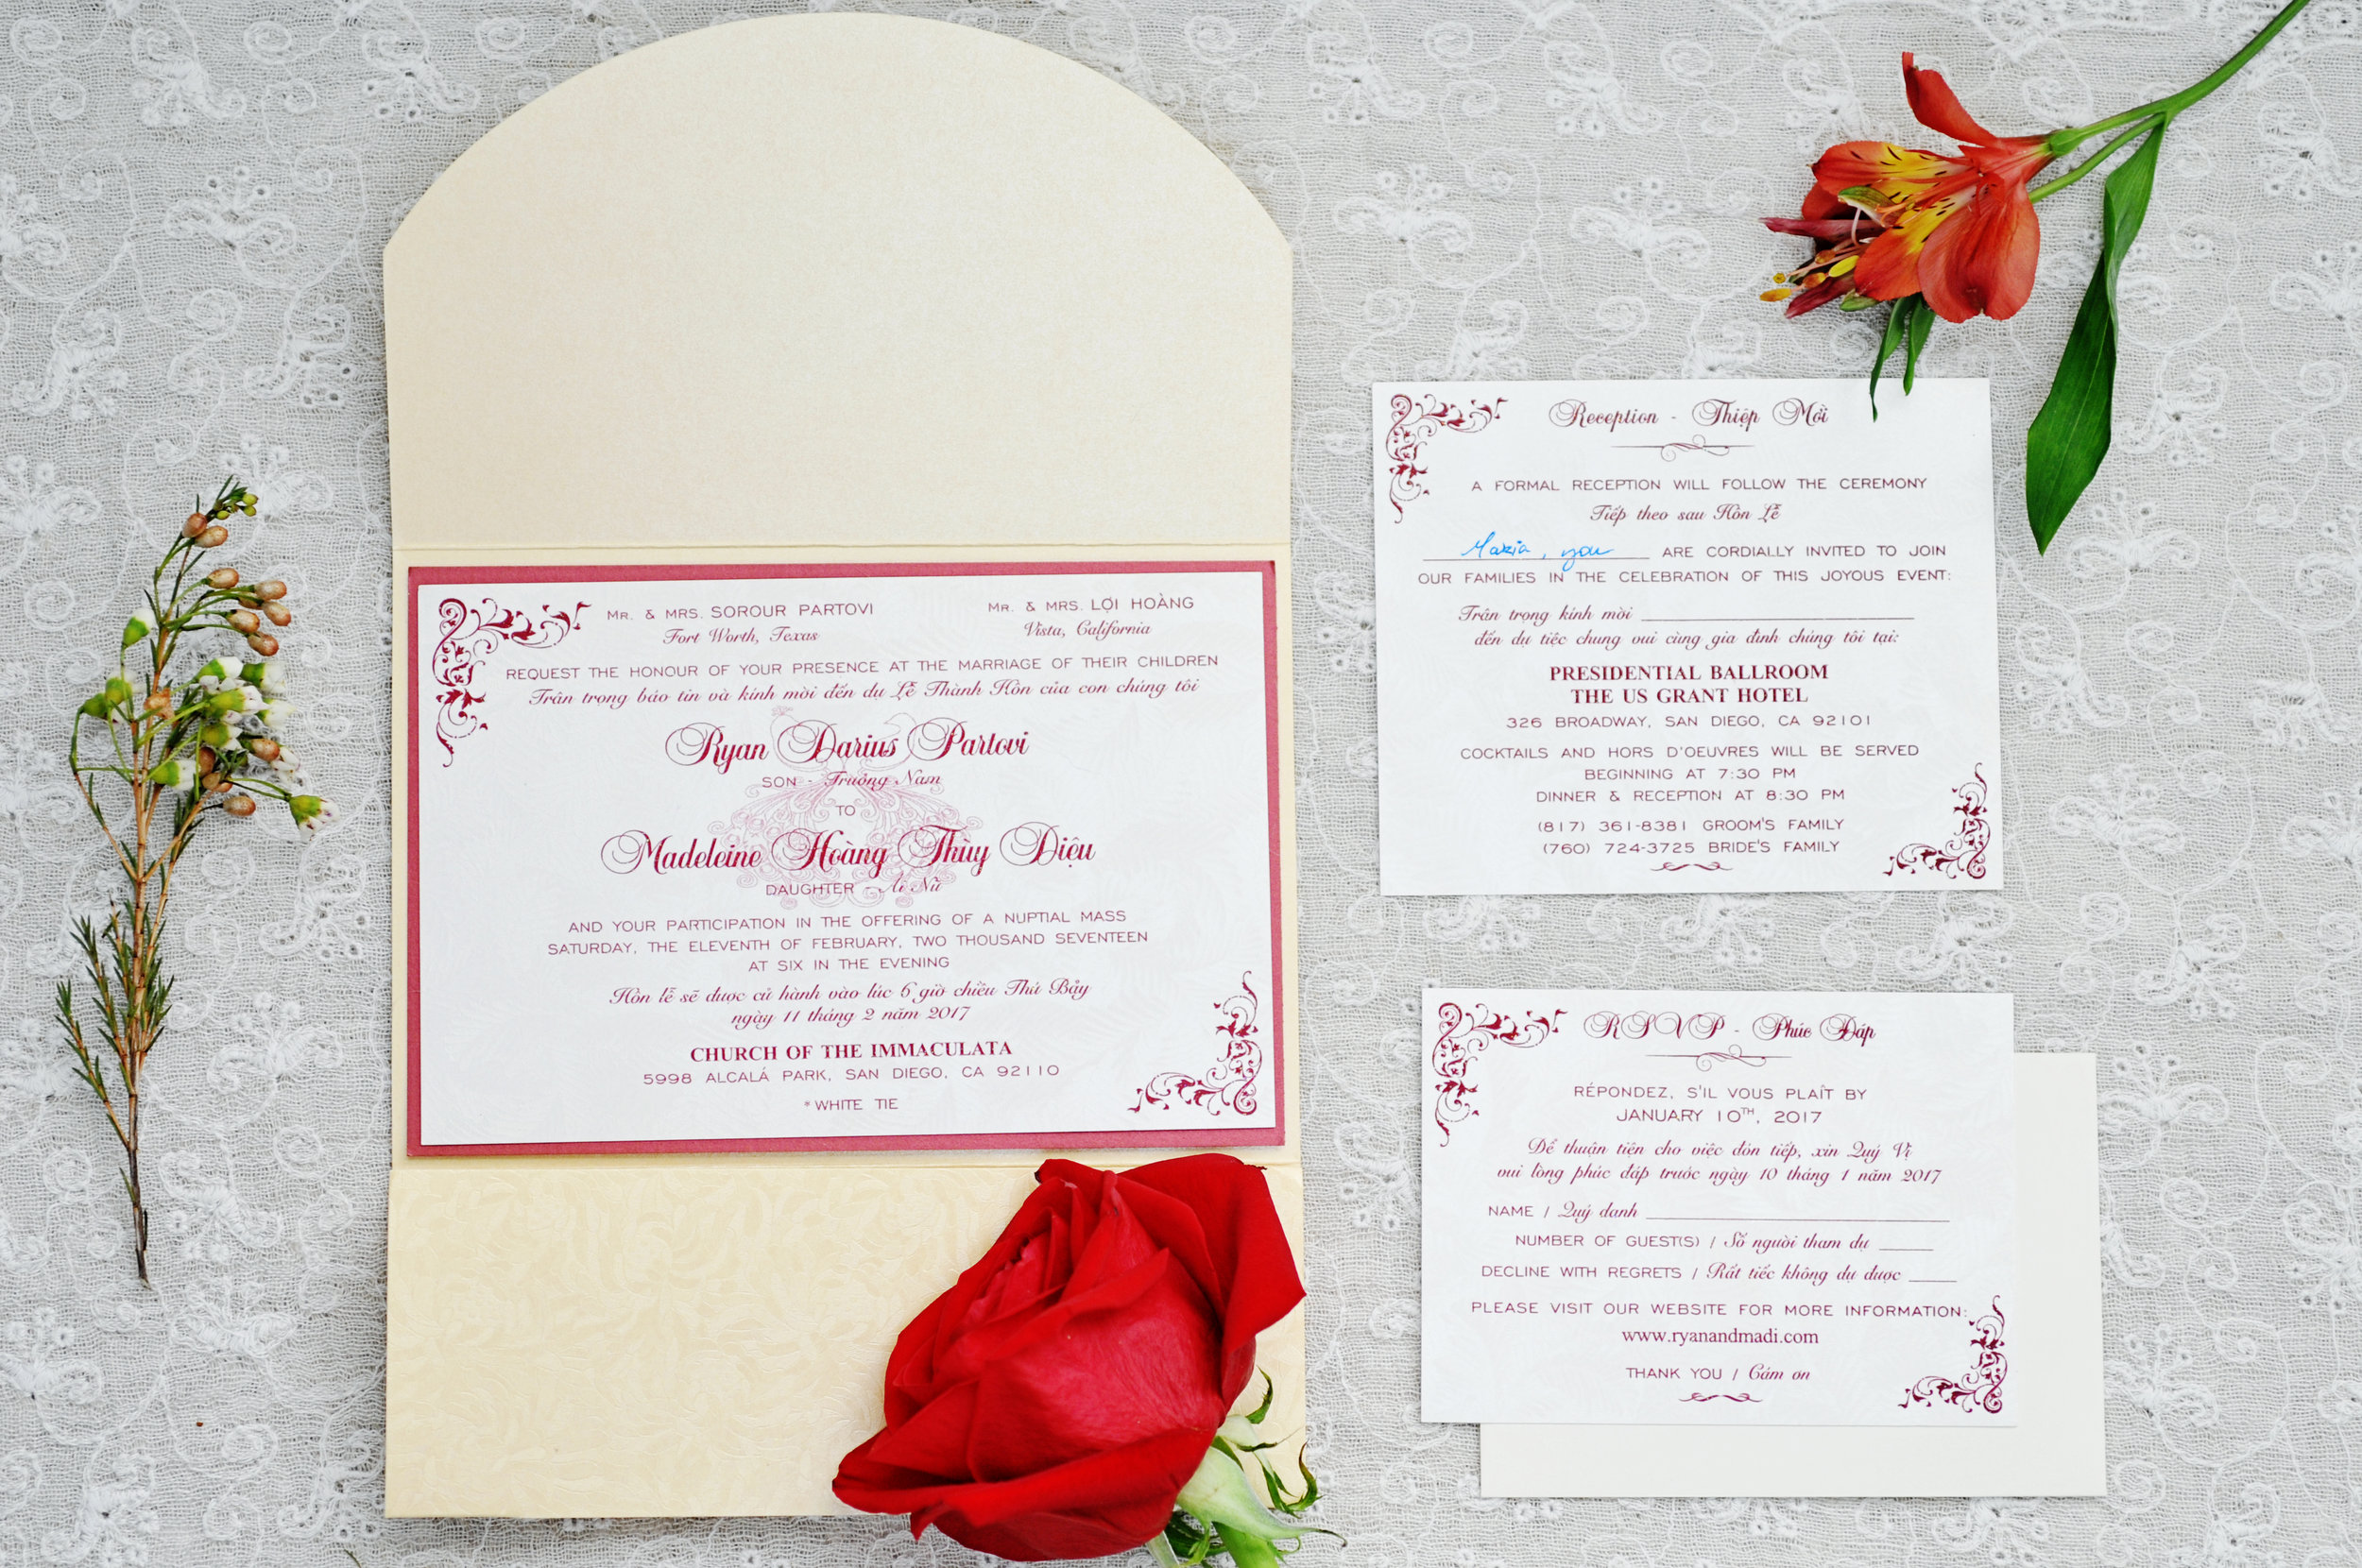 Partovi Wedding 2275 by maria pablo.jpg